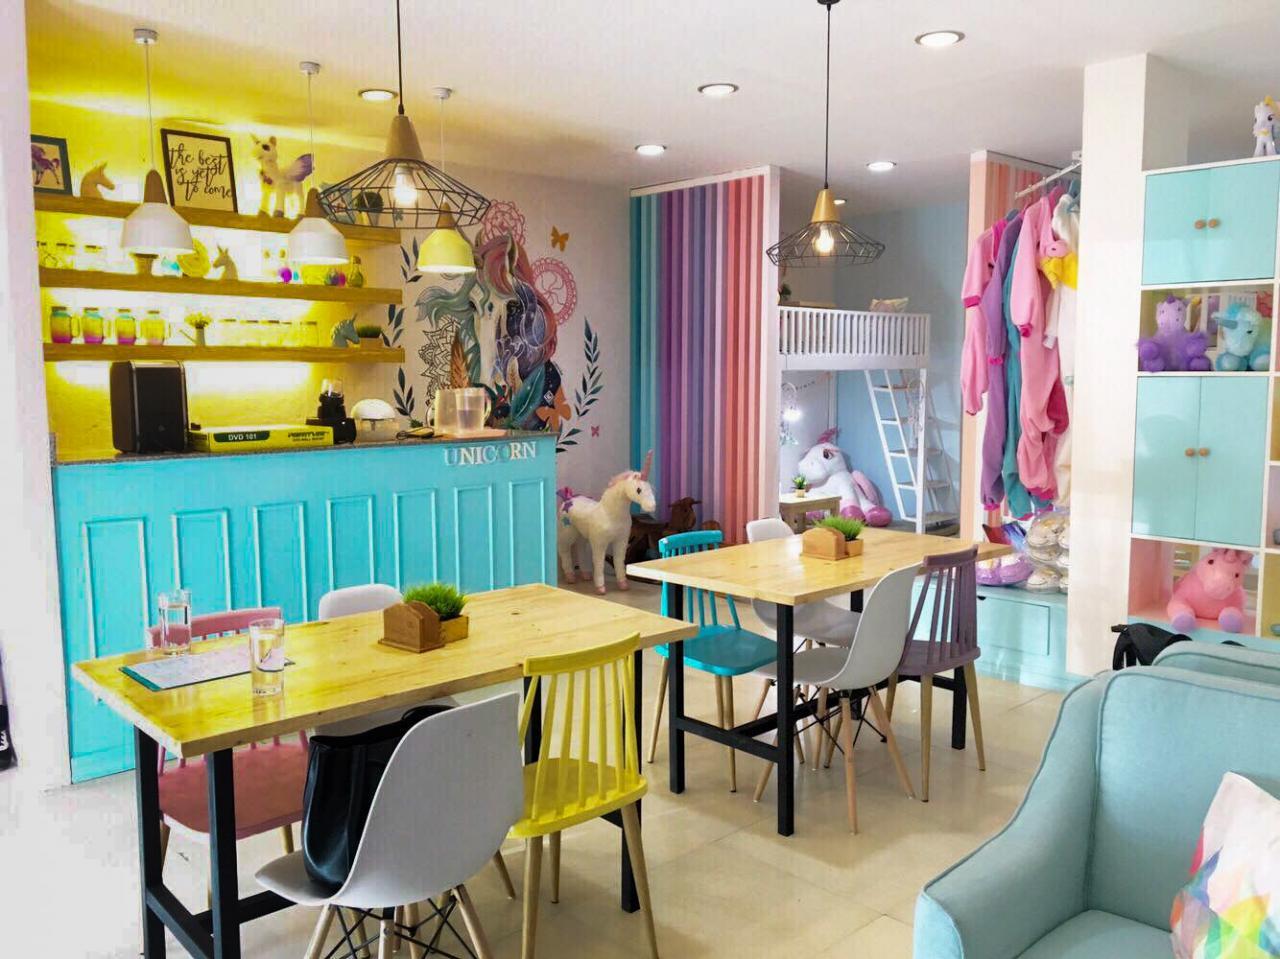 house of unicorns cafe interior